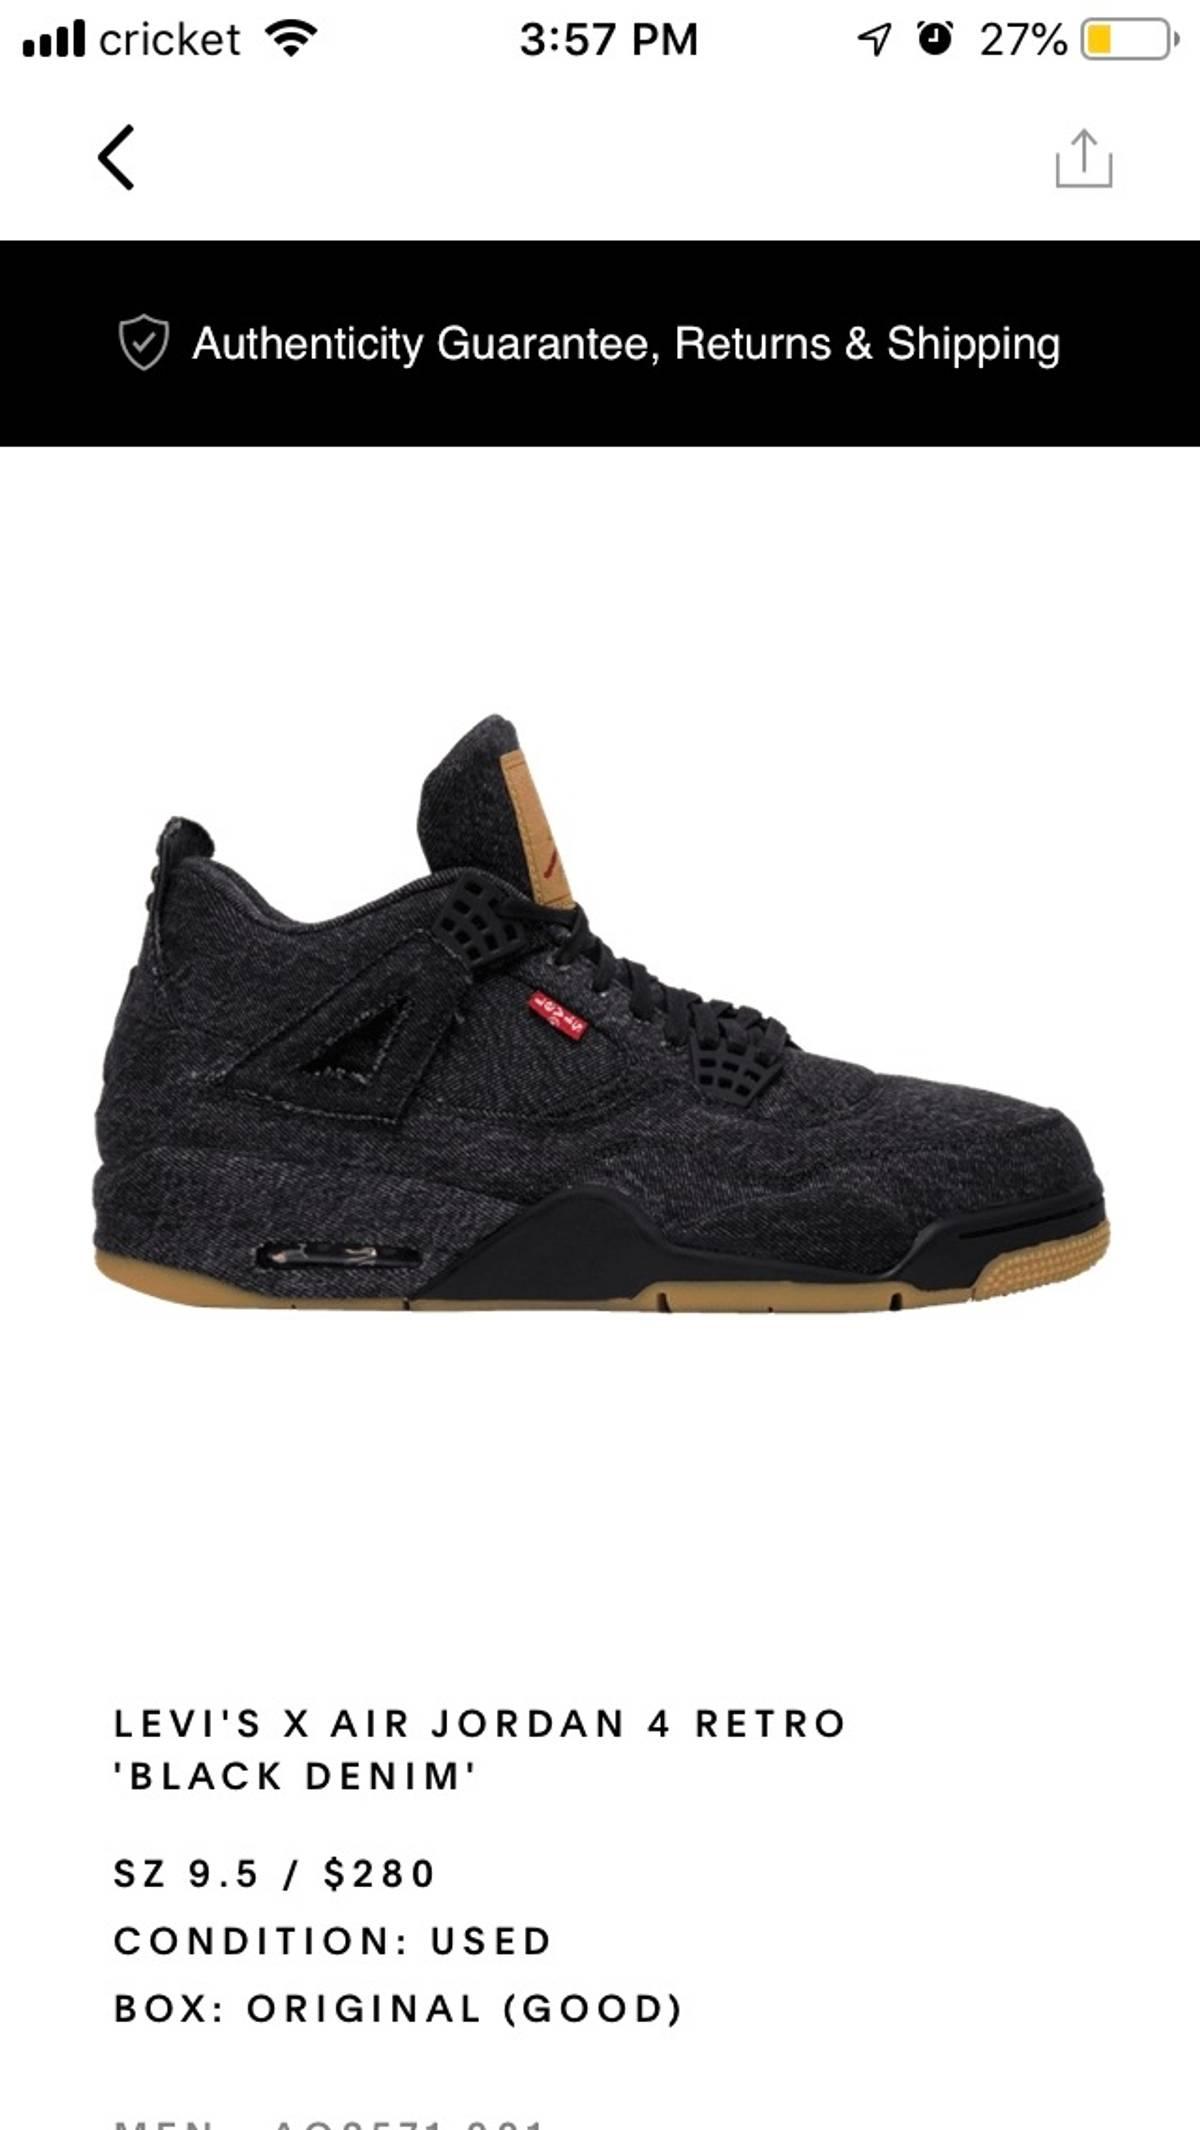 low priced f4167 7a08d Jordan Brand × Levi's Levi X Air Jordan 4 Black Size 9.5 $280